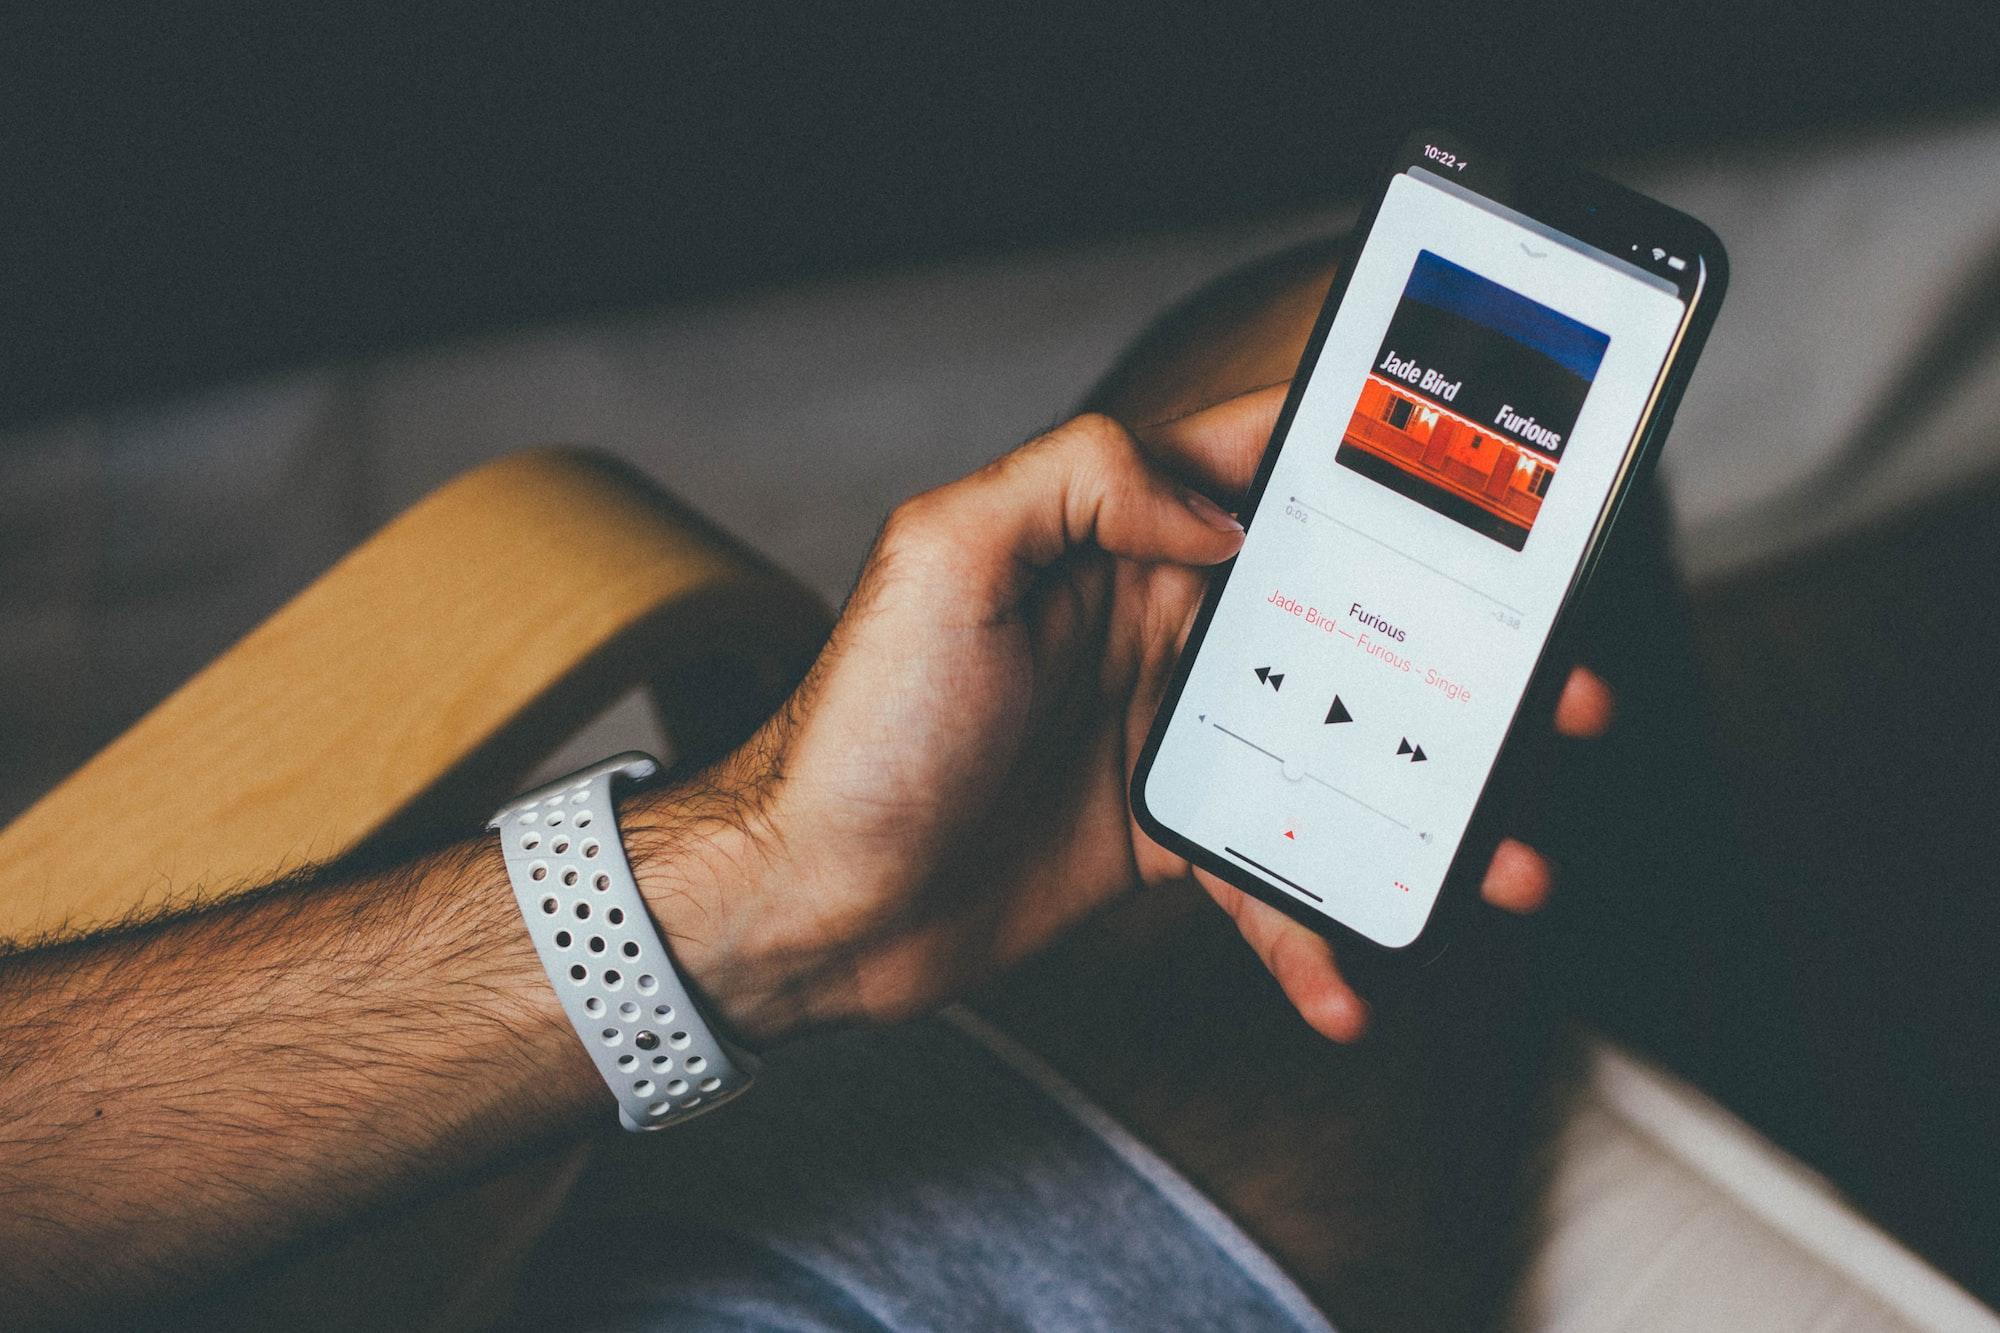 Adormece a ouvir a tua música favorita no Apple Music